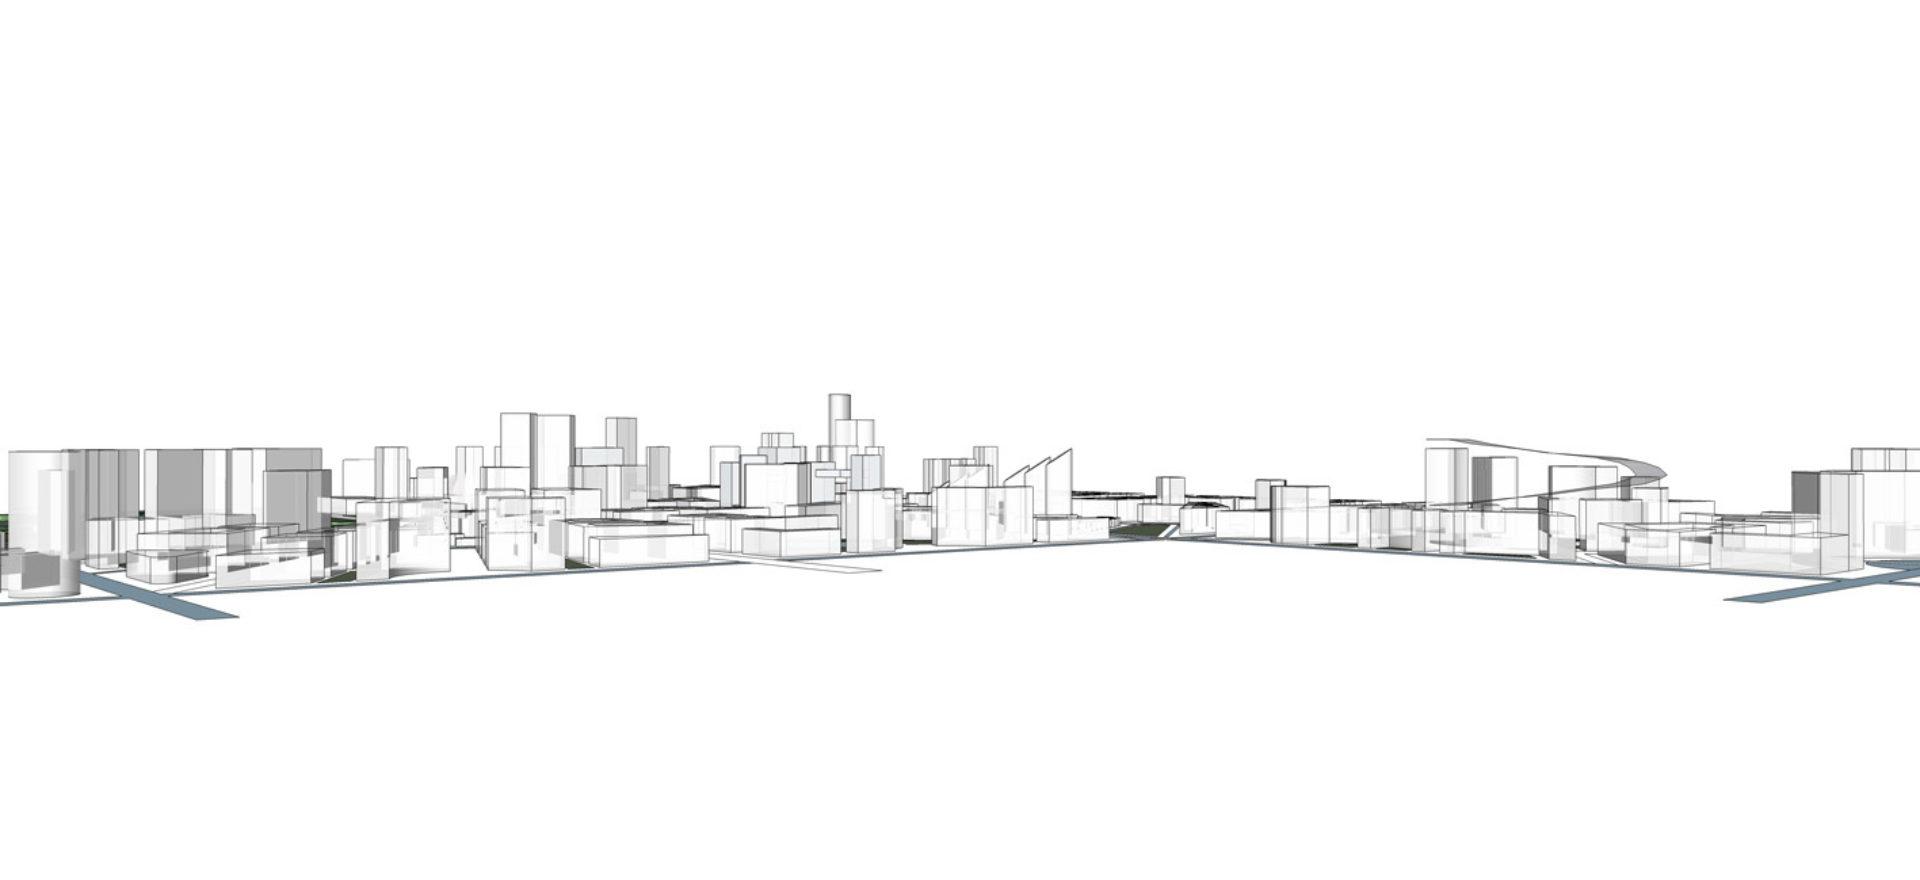 Image of Baoshan Future City